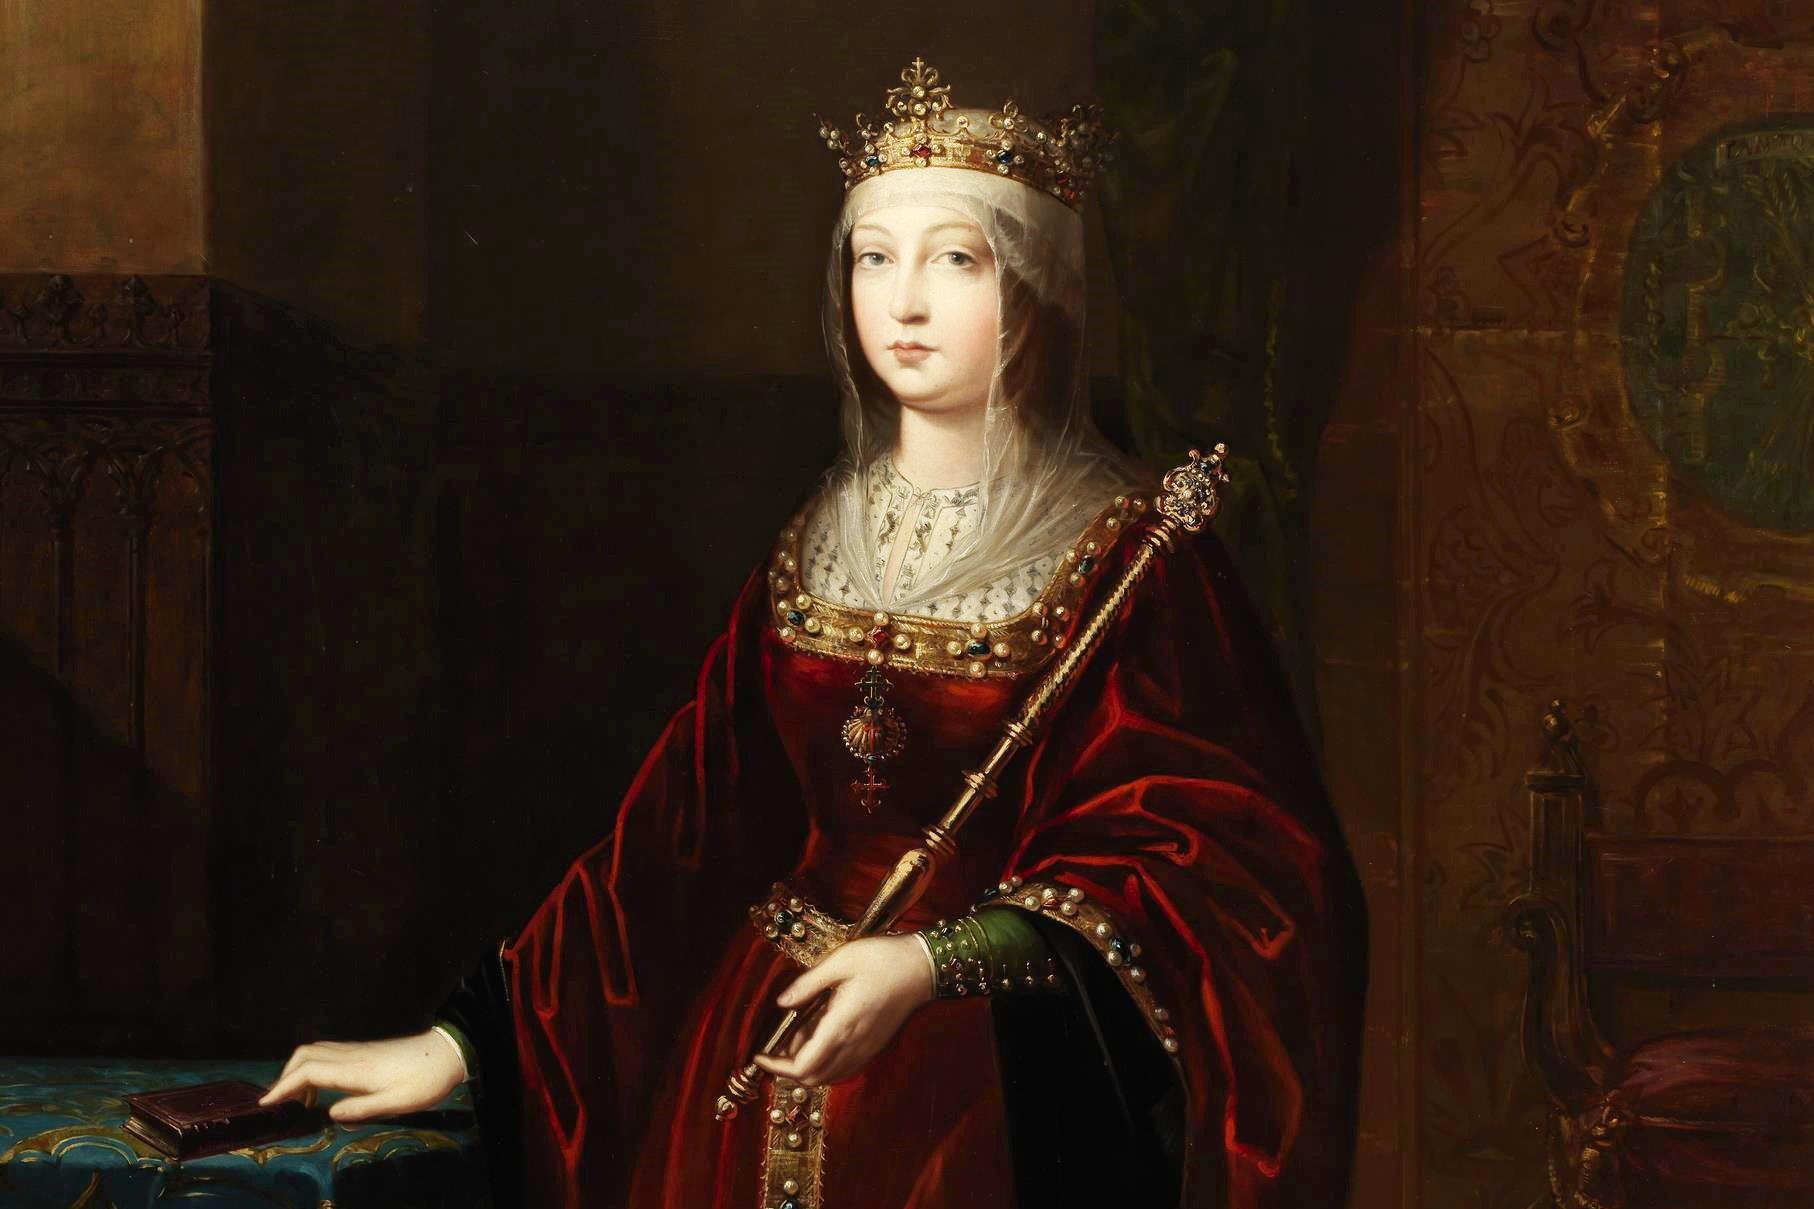 Isabella I (1451-1504) Queen of Castile